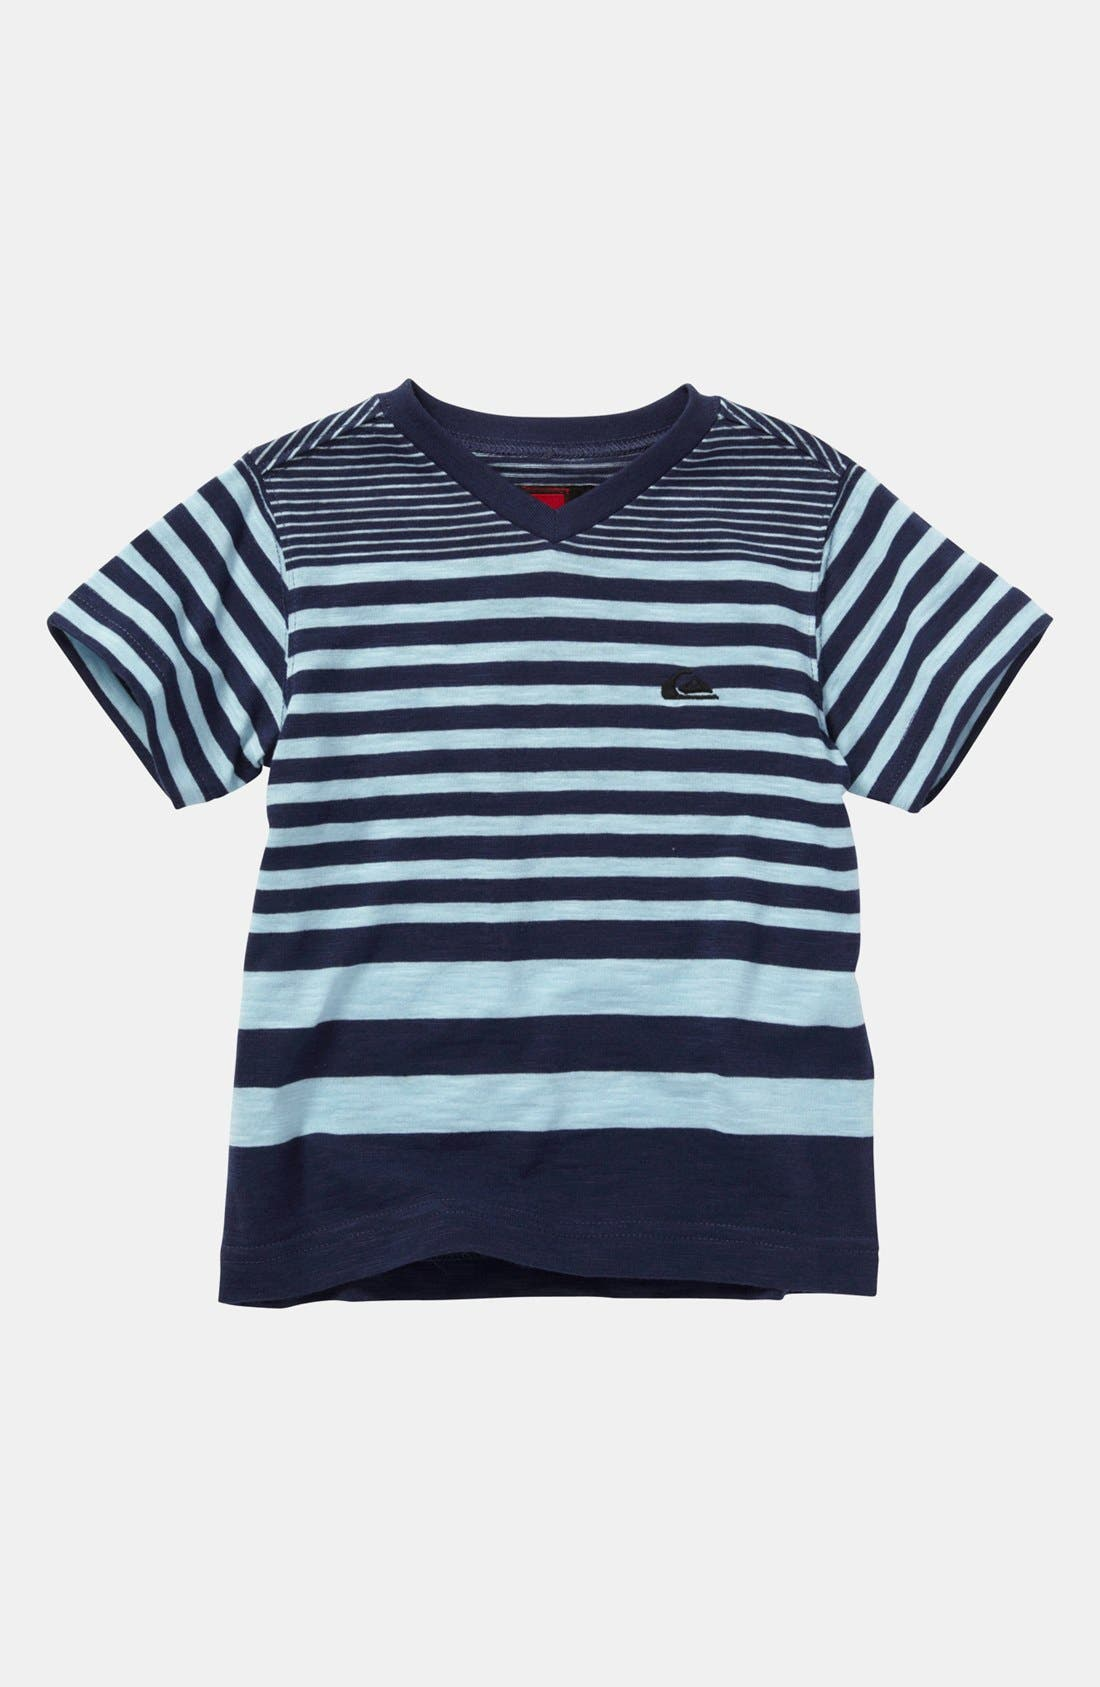 Main Image - Quiksilver 'Car Path' T-Shirt (Baby)